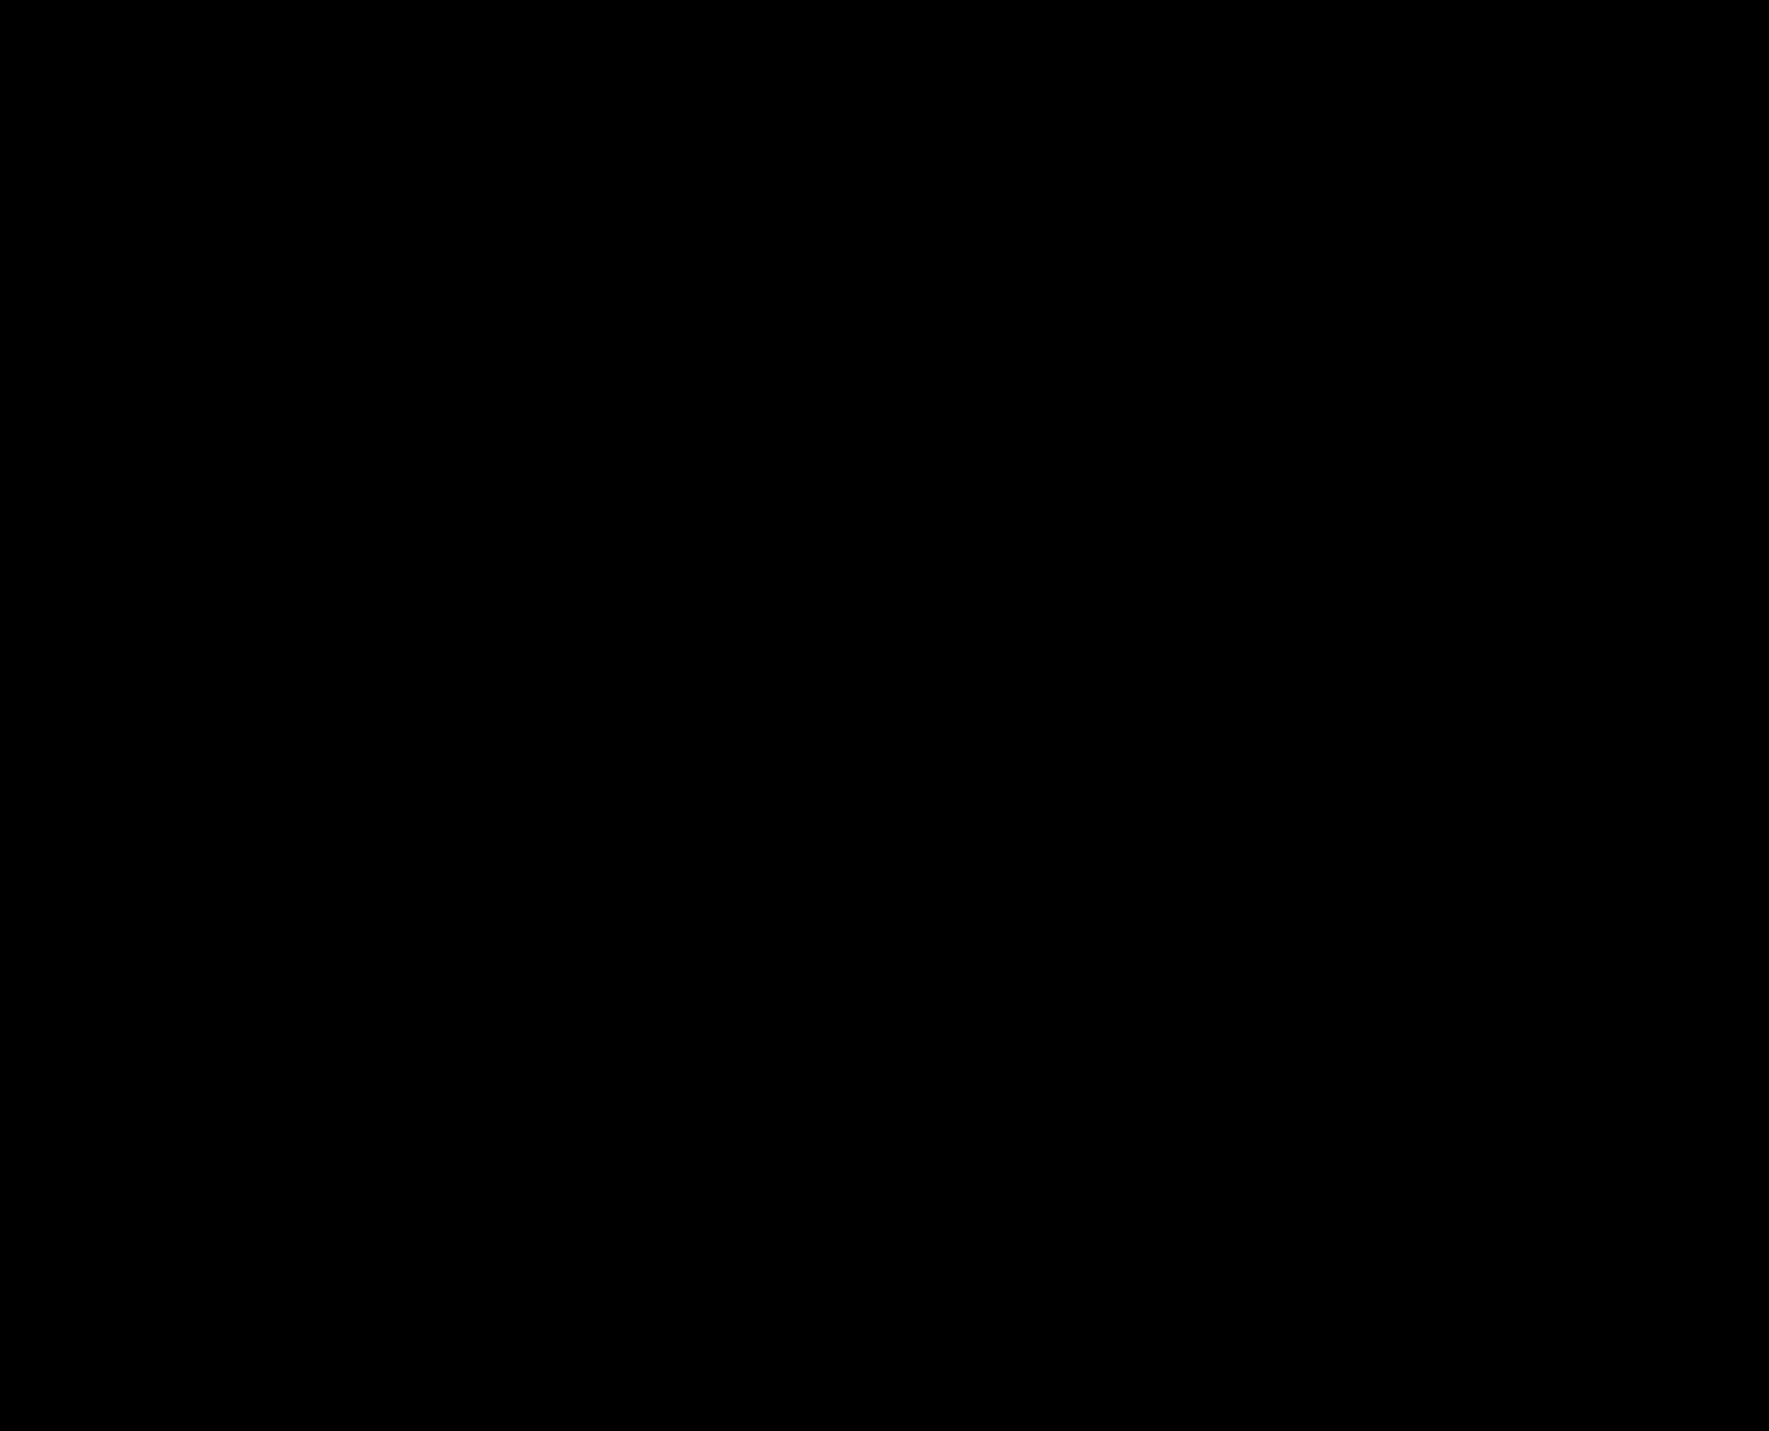 crabwalk-logo-black